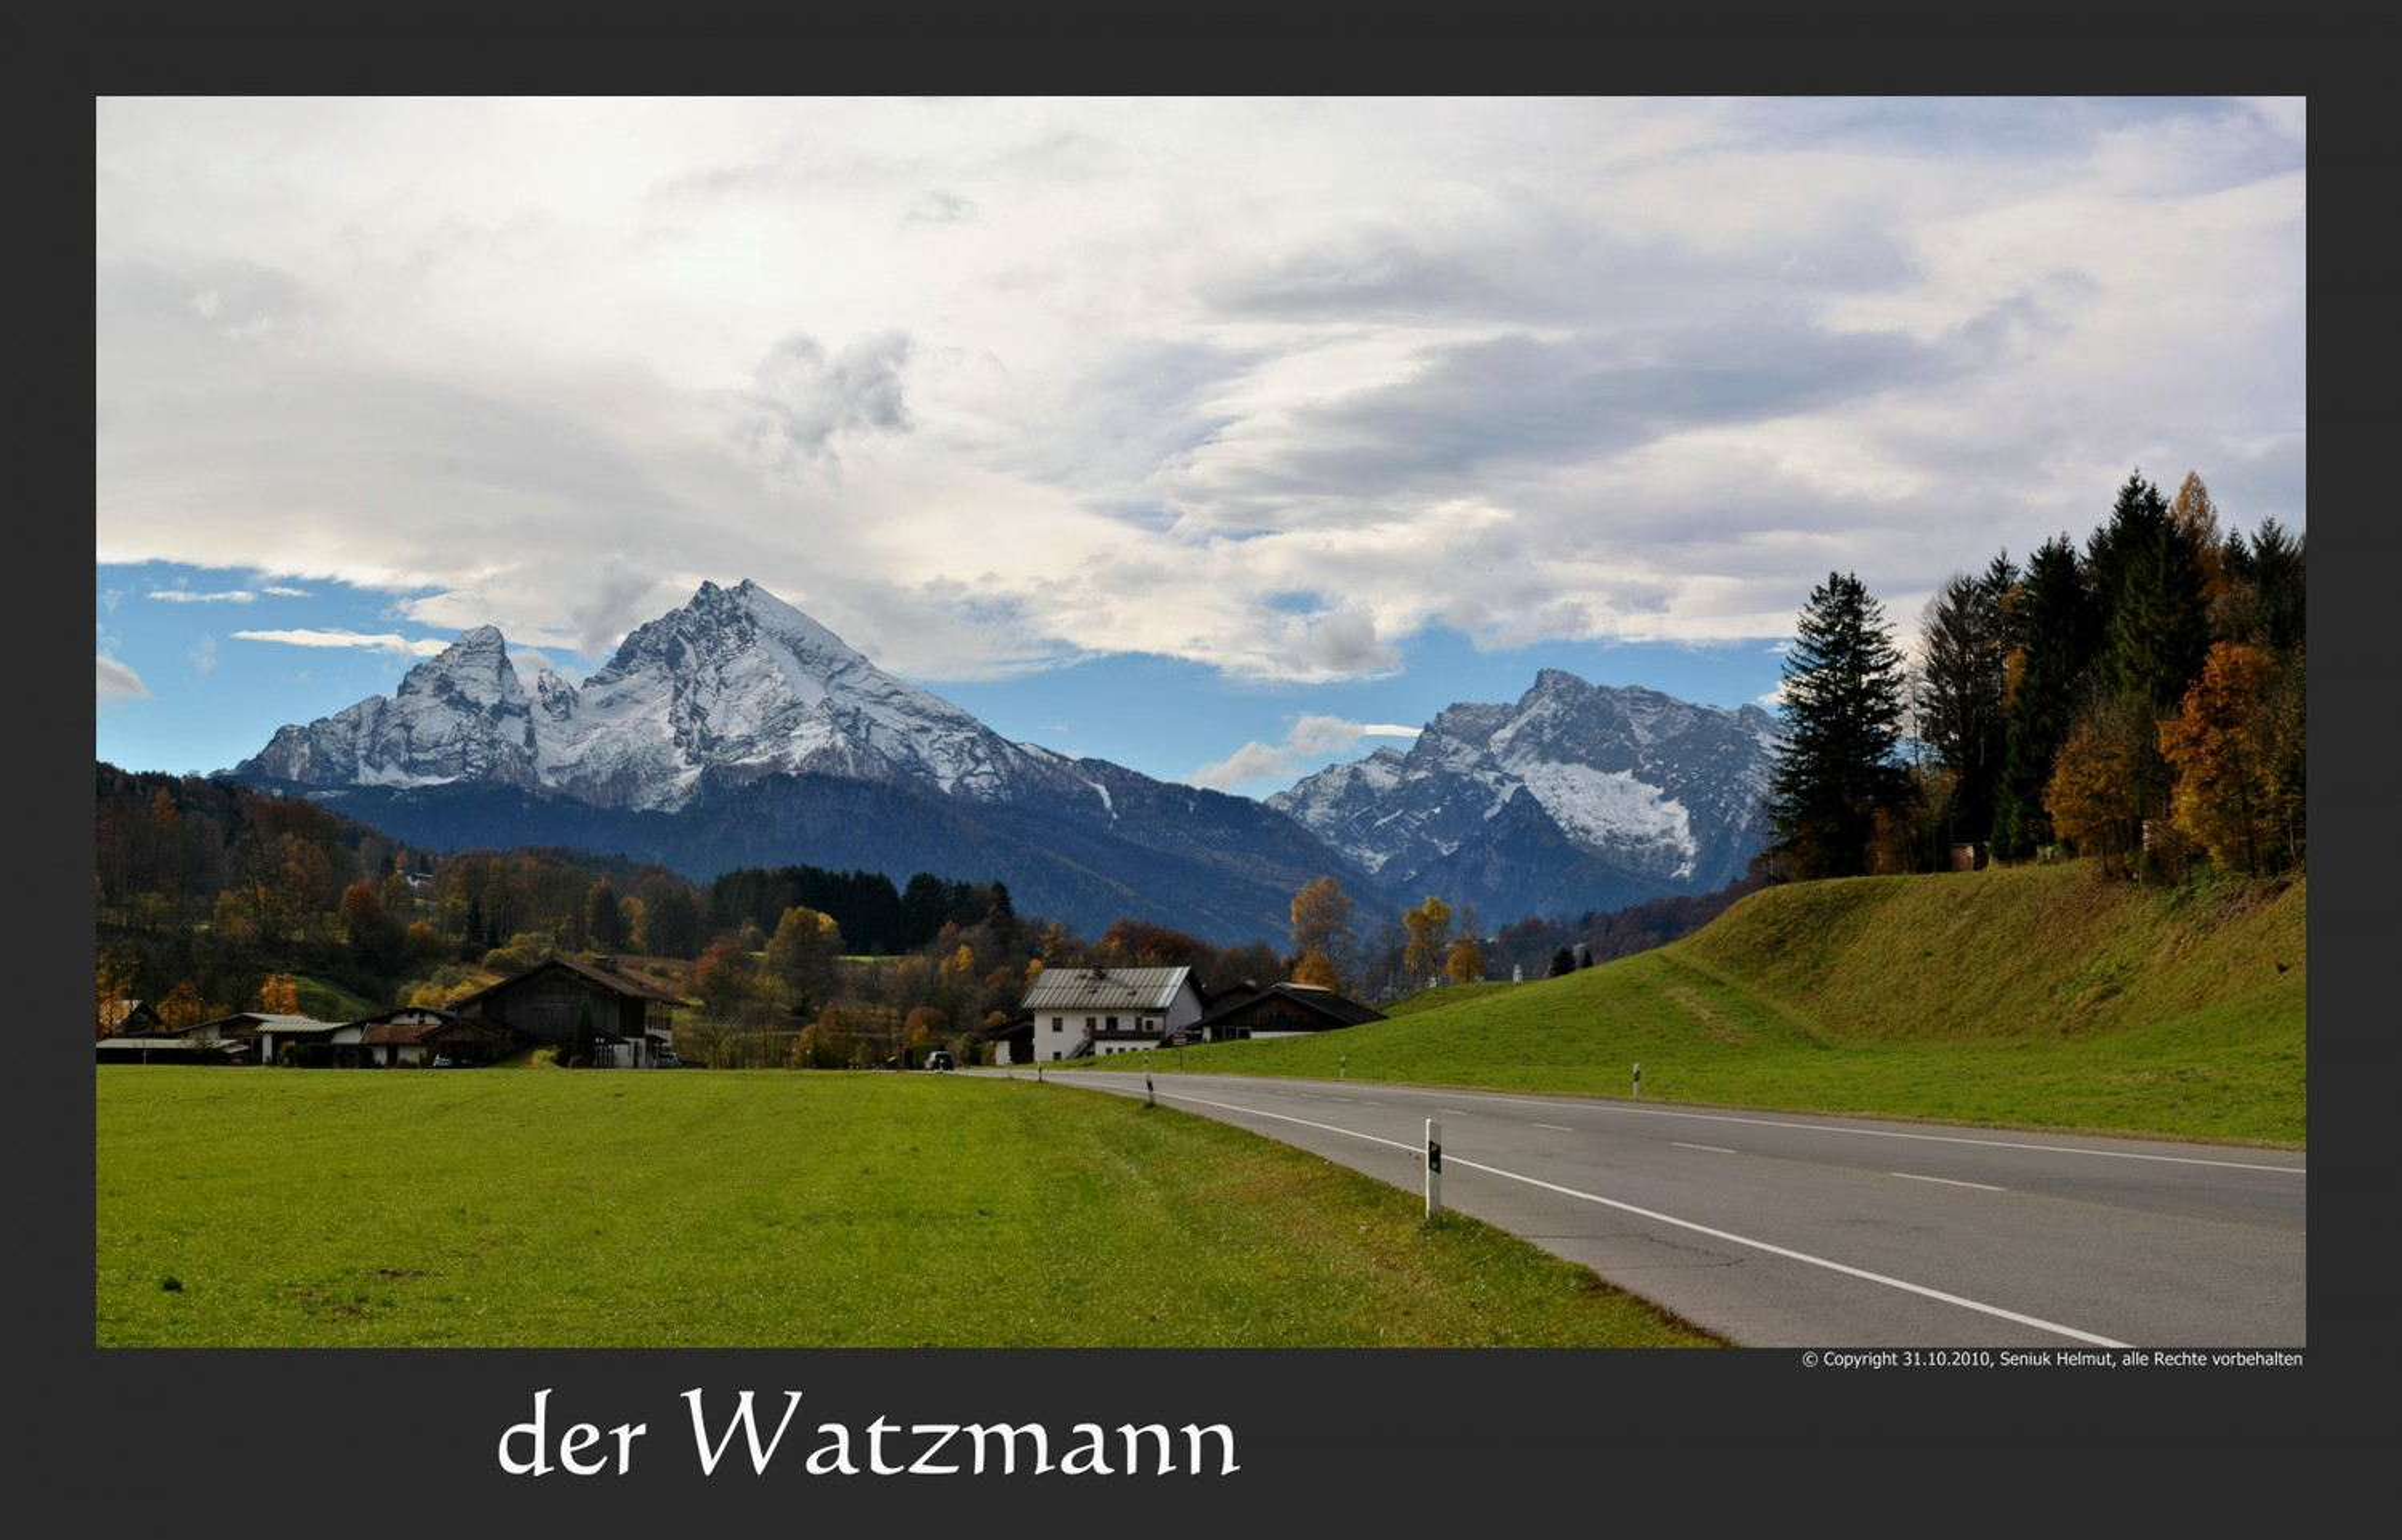 Watzmann Salzburg